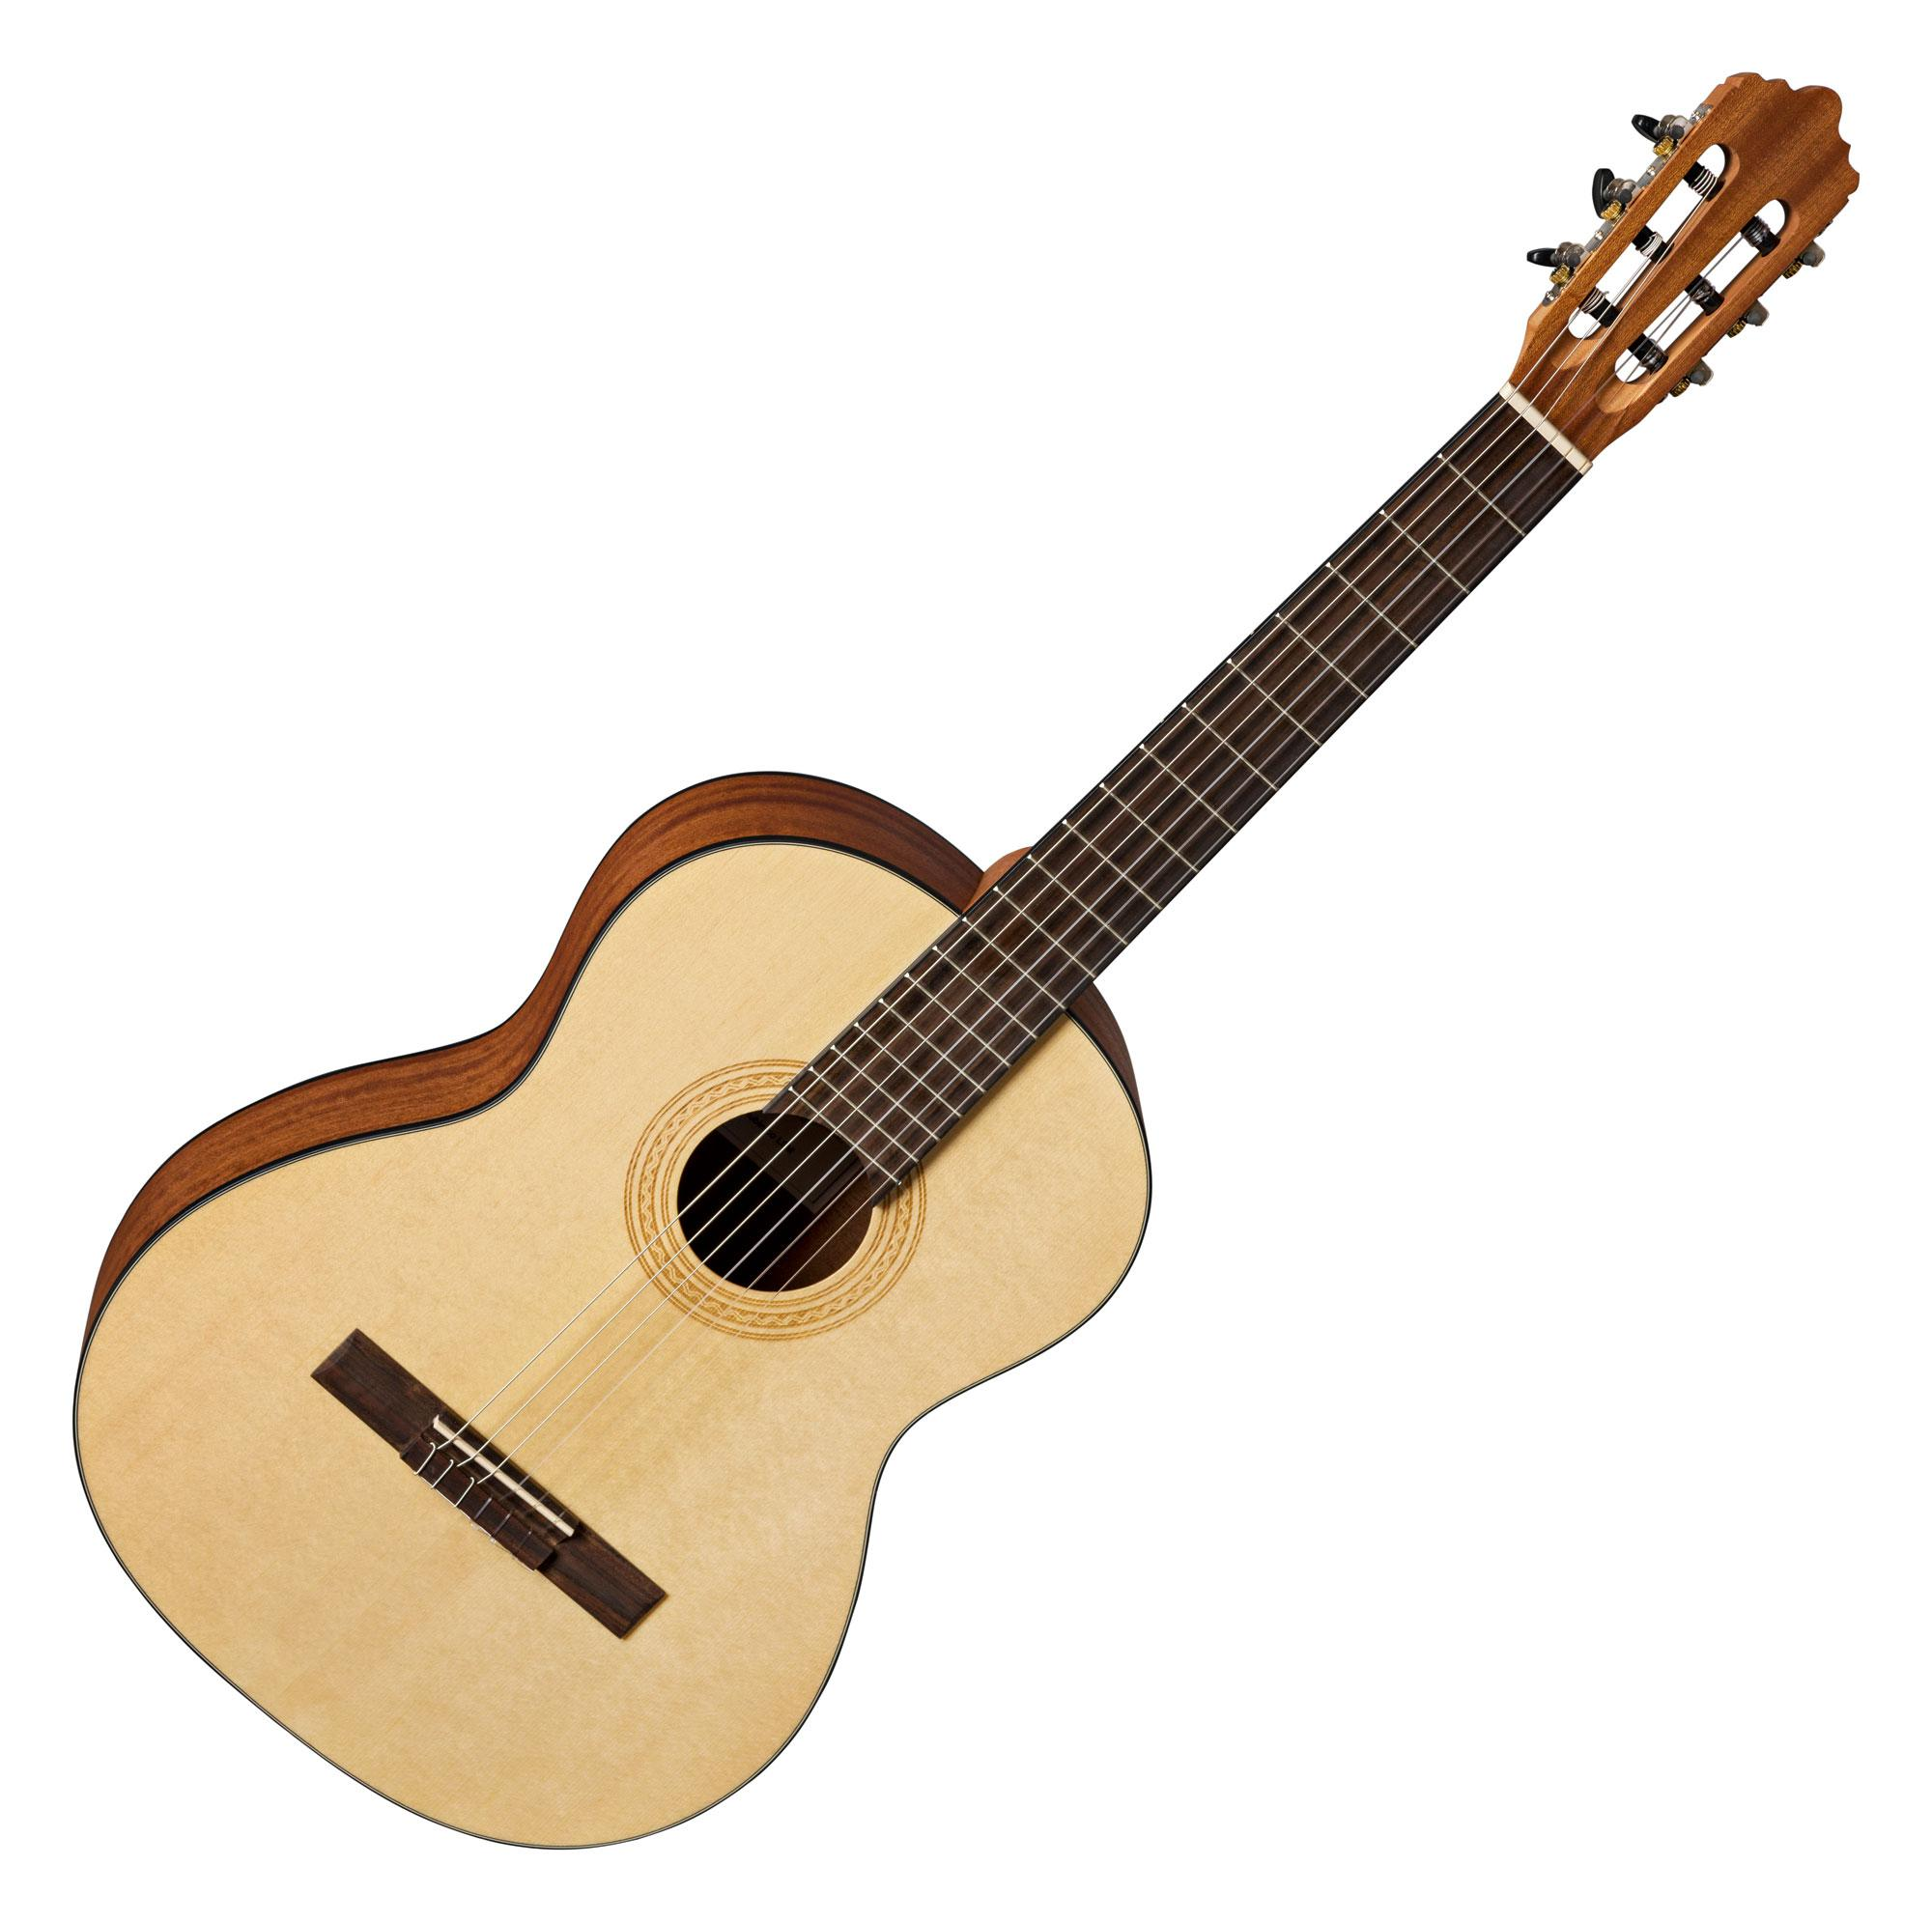 La Mancha Rubinito lsm 59 3 4 Konzertgitarre